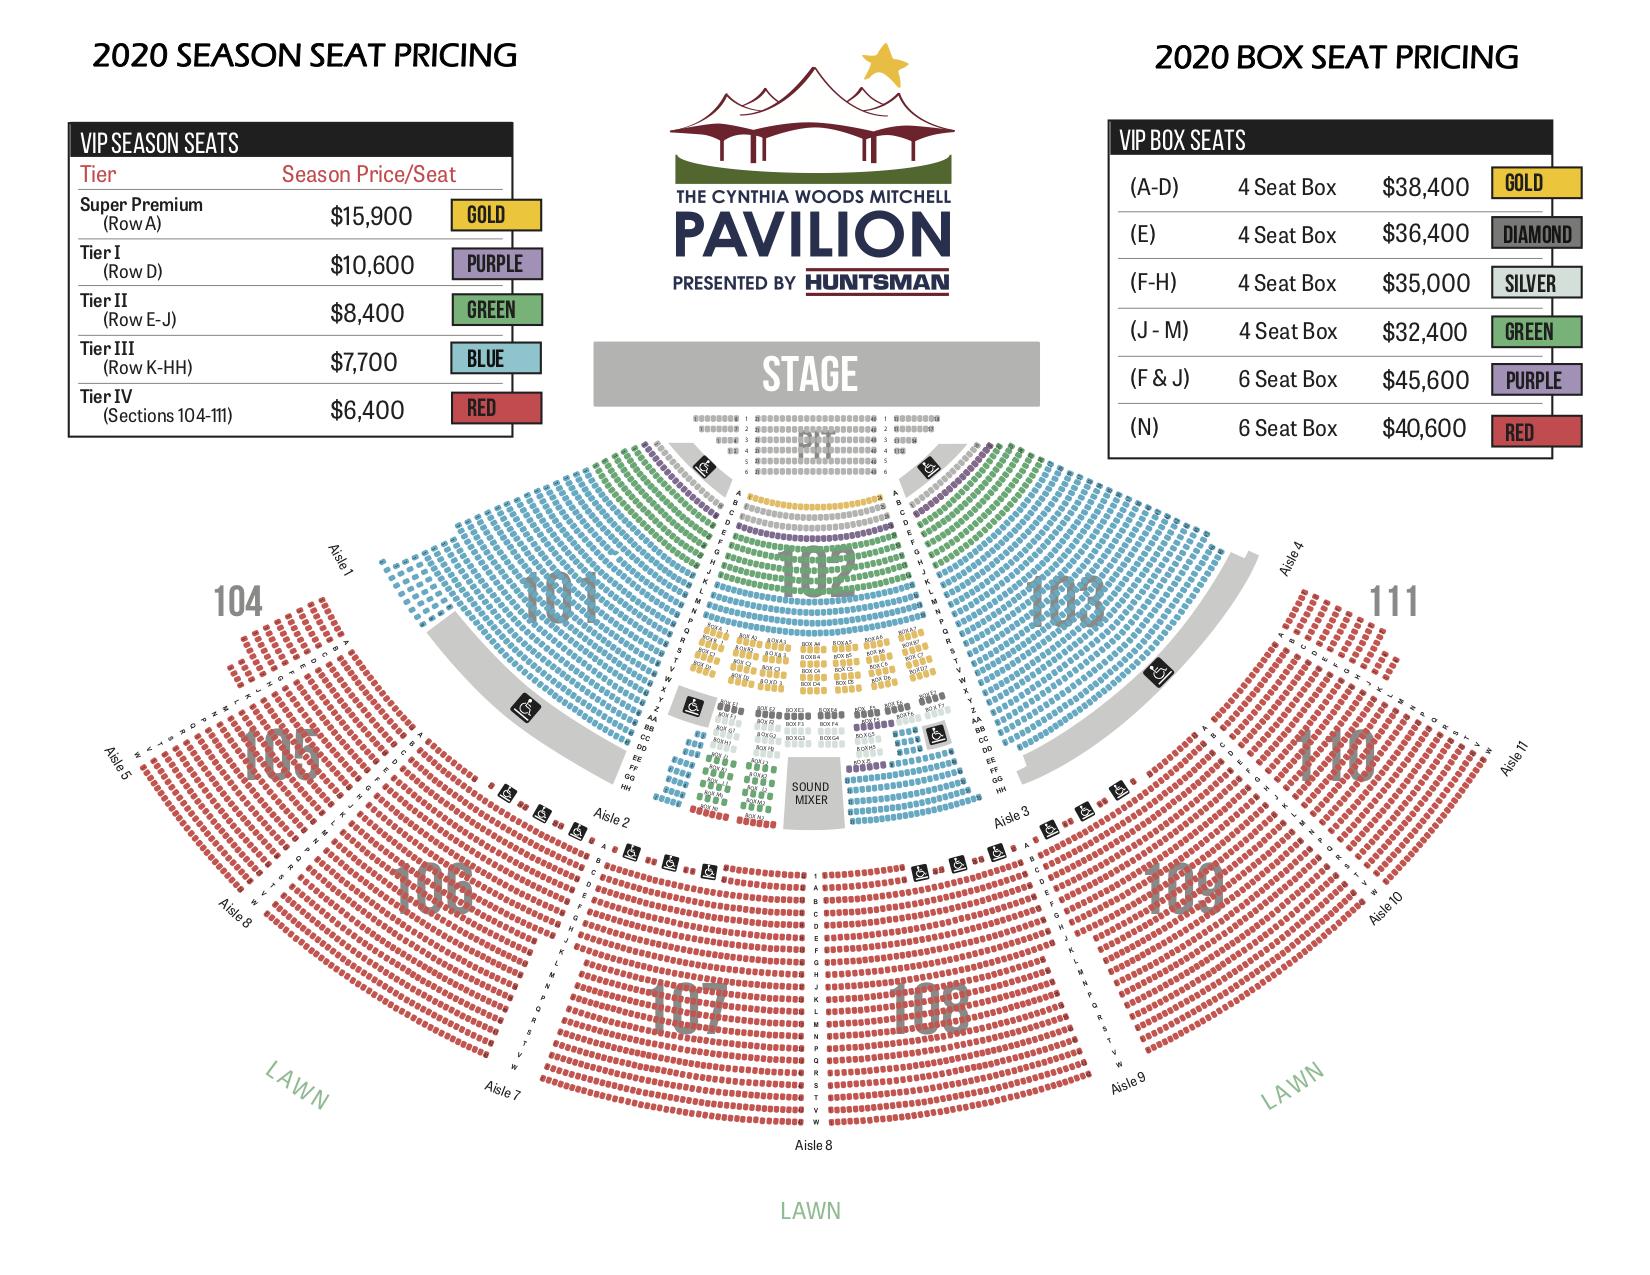 Pavilion Seating Chart